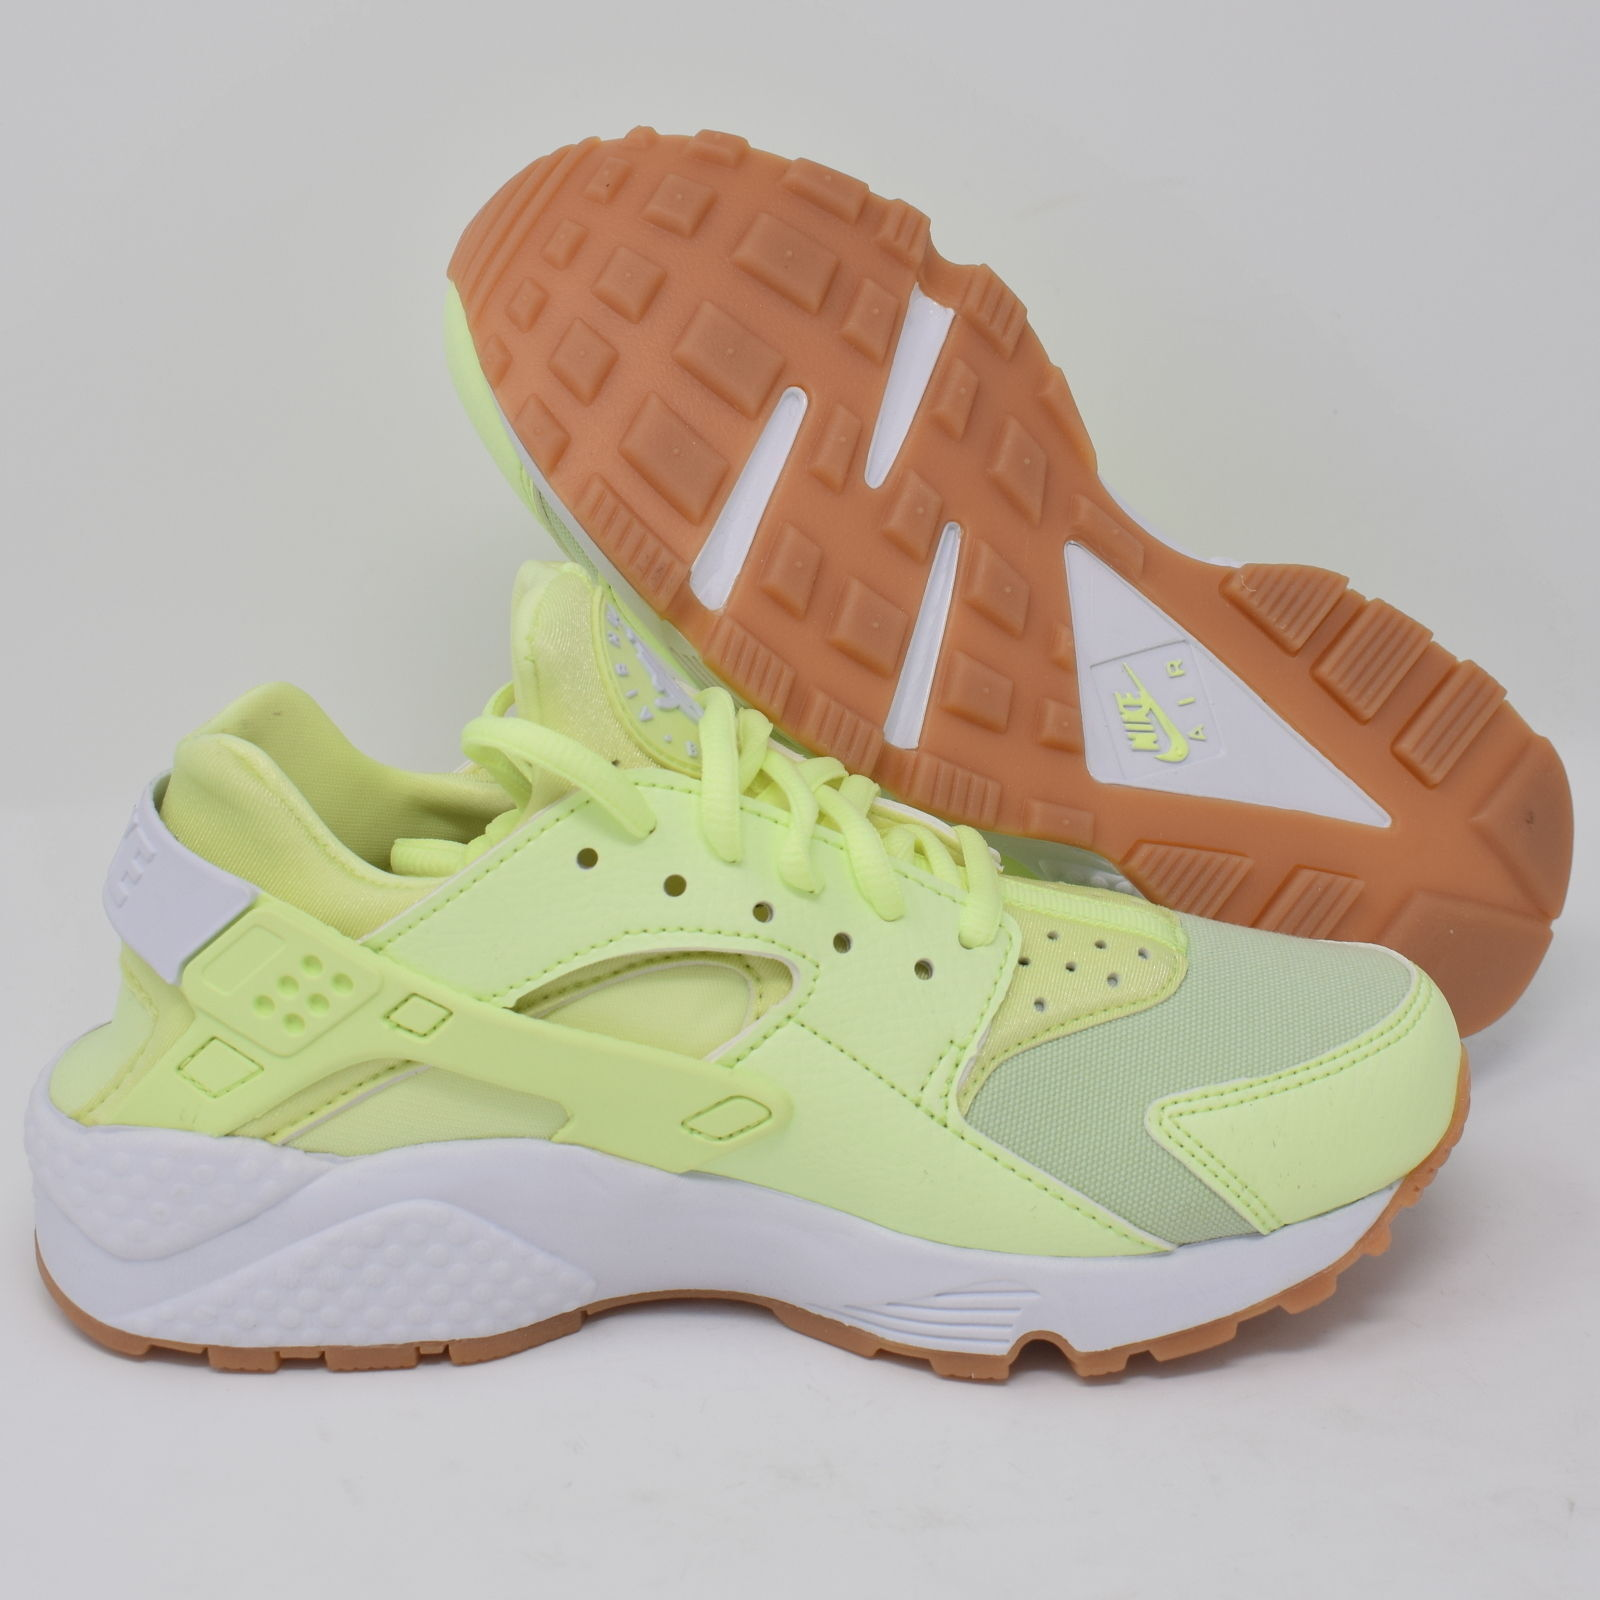 Nike Air Huarache Run 634835-702 Womens Running shoes Barely Volt & Yellow